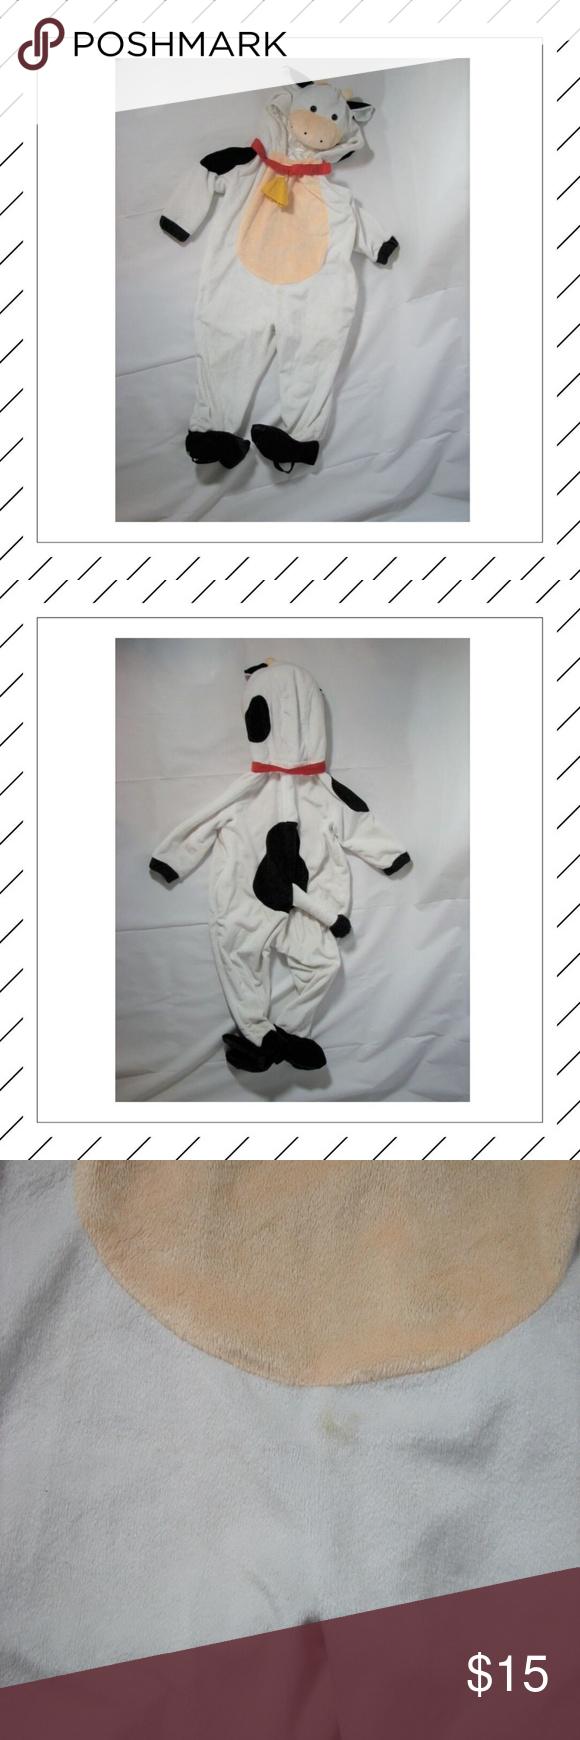 Kuh Kostüm Kleinkind 2-3T Halloween Entzückendes Kuh ...